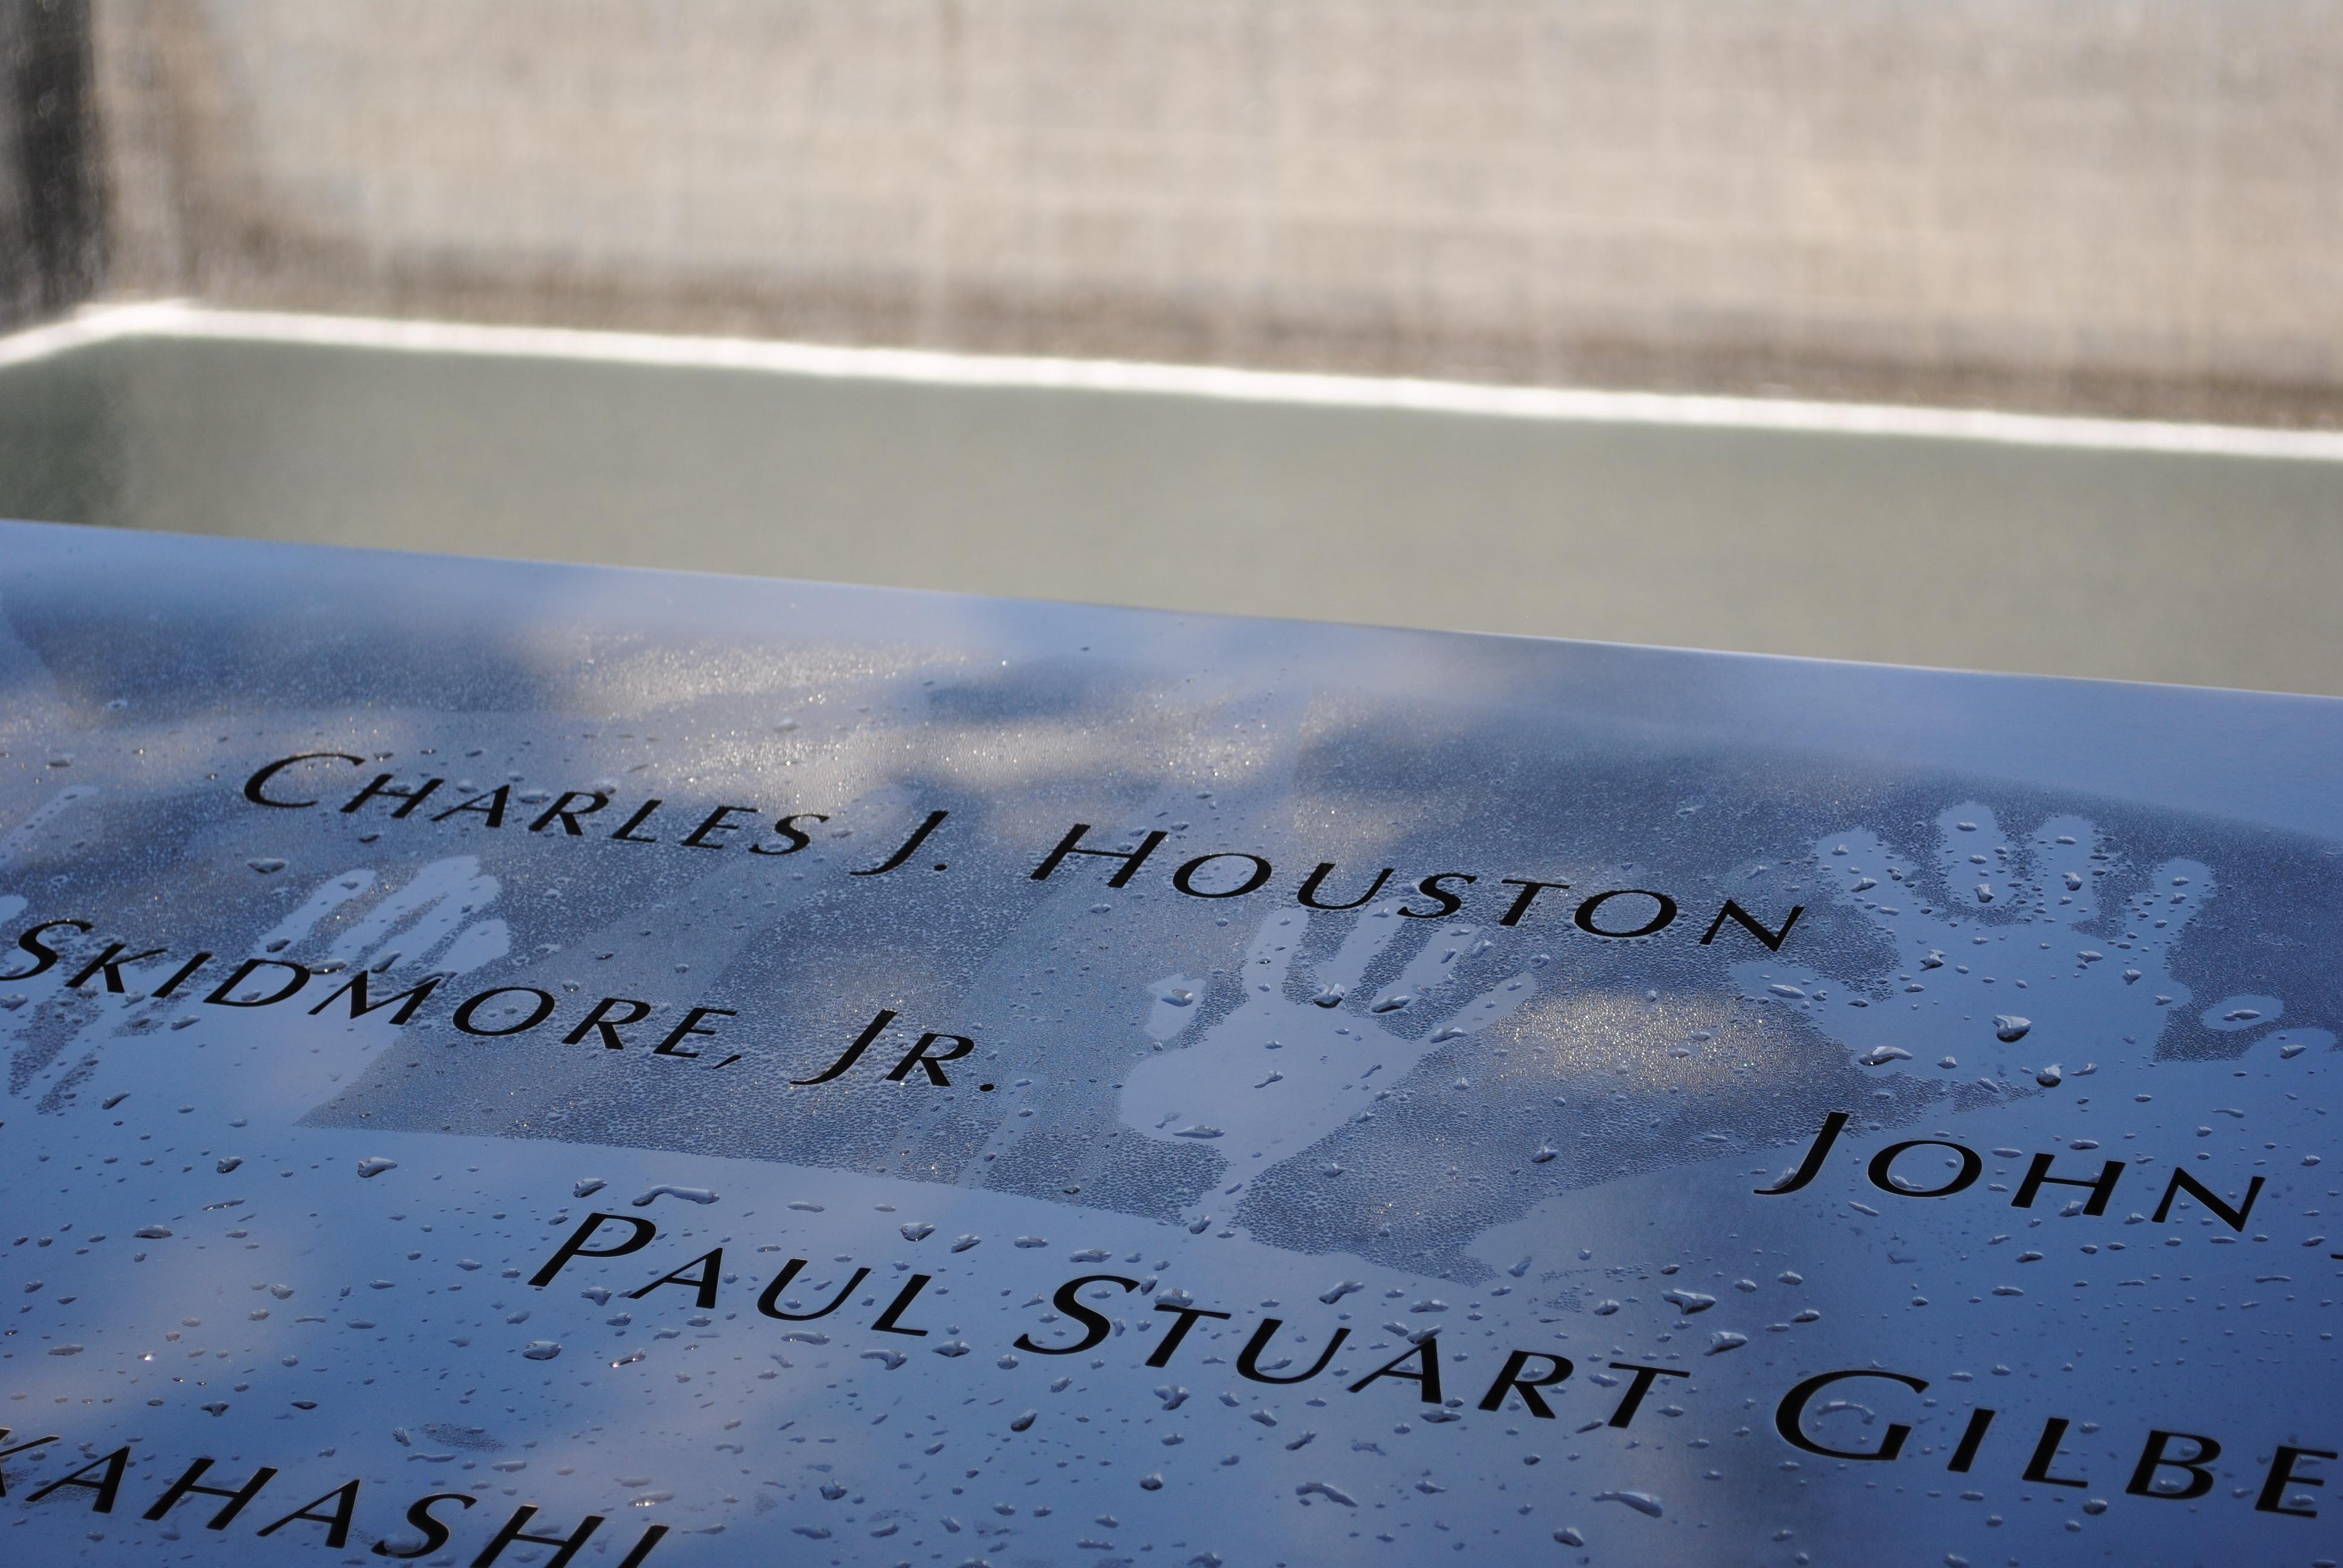 Handprints on the 9/11 Memorial